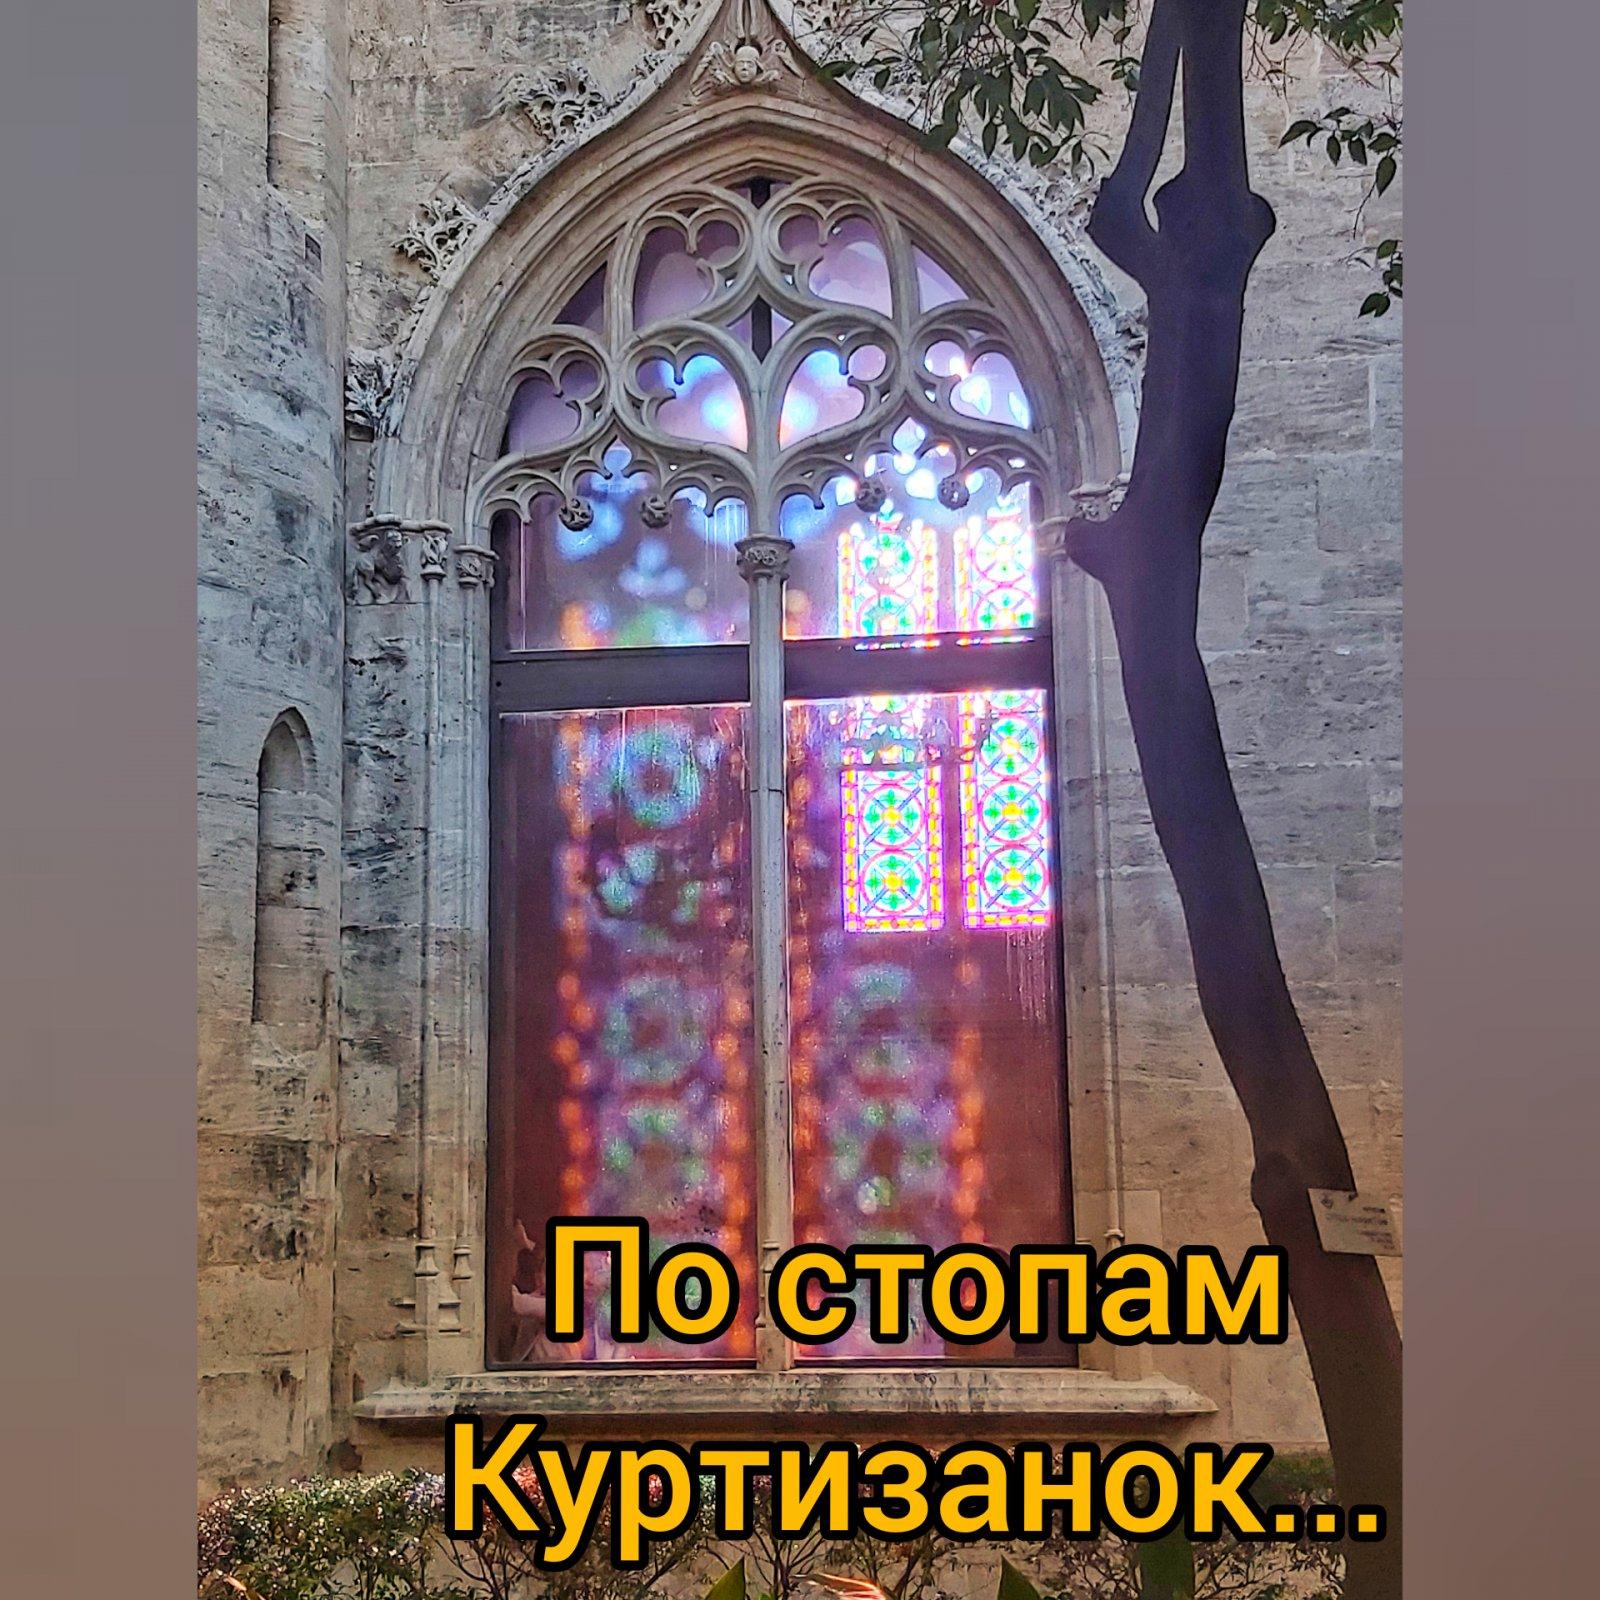 25.07 «По следам куртизанок»